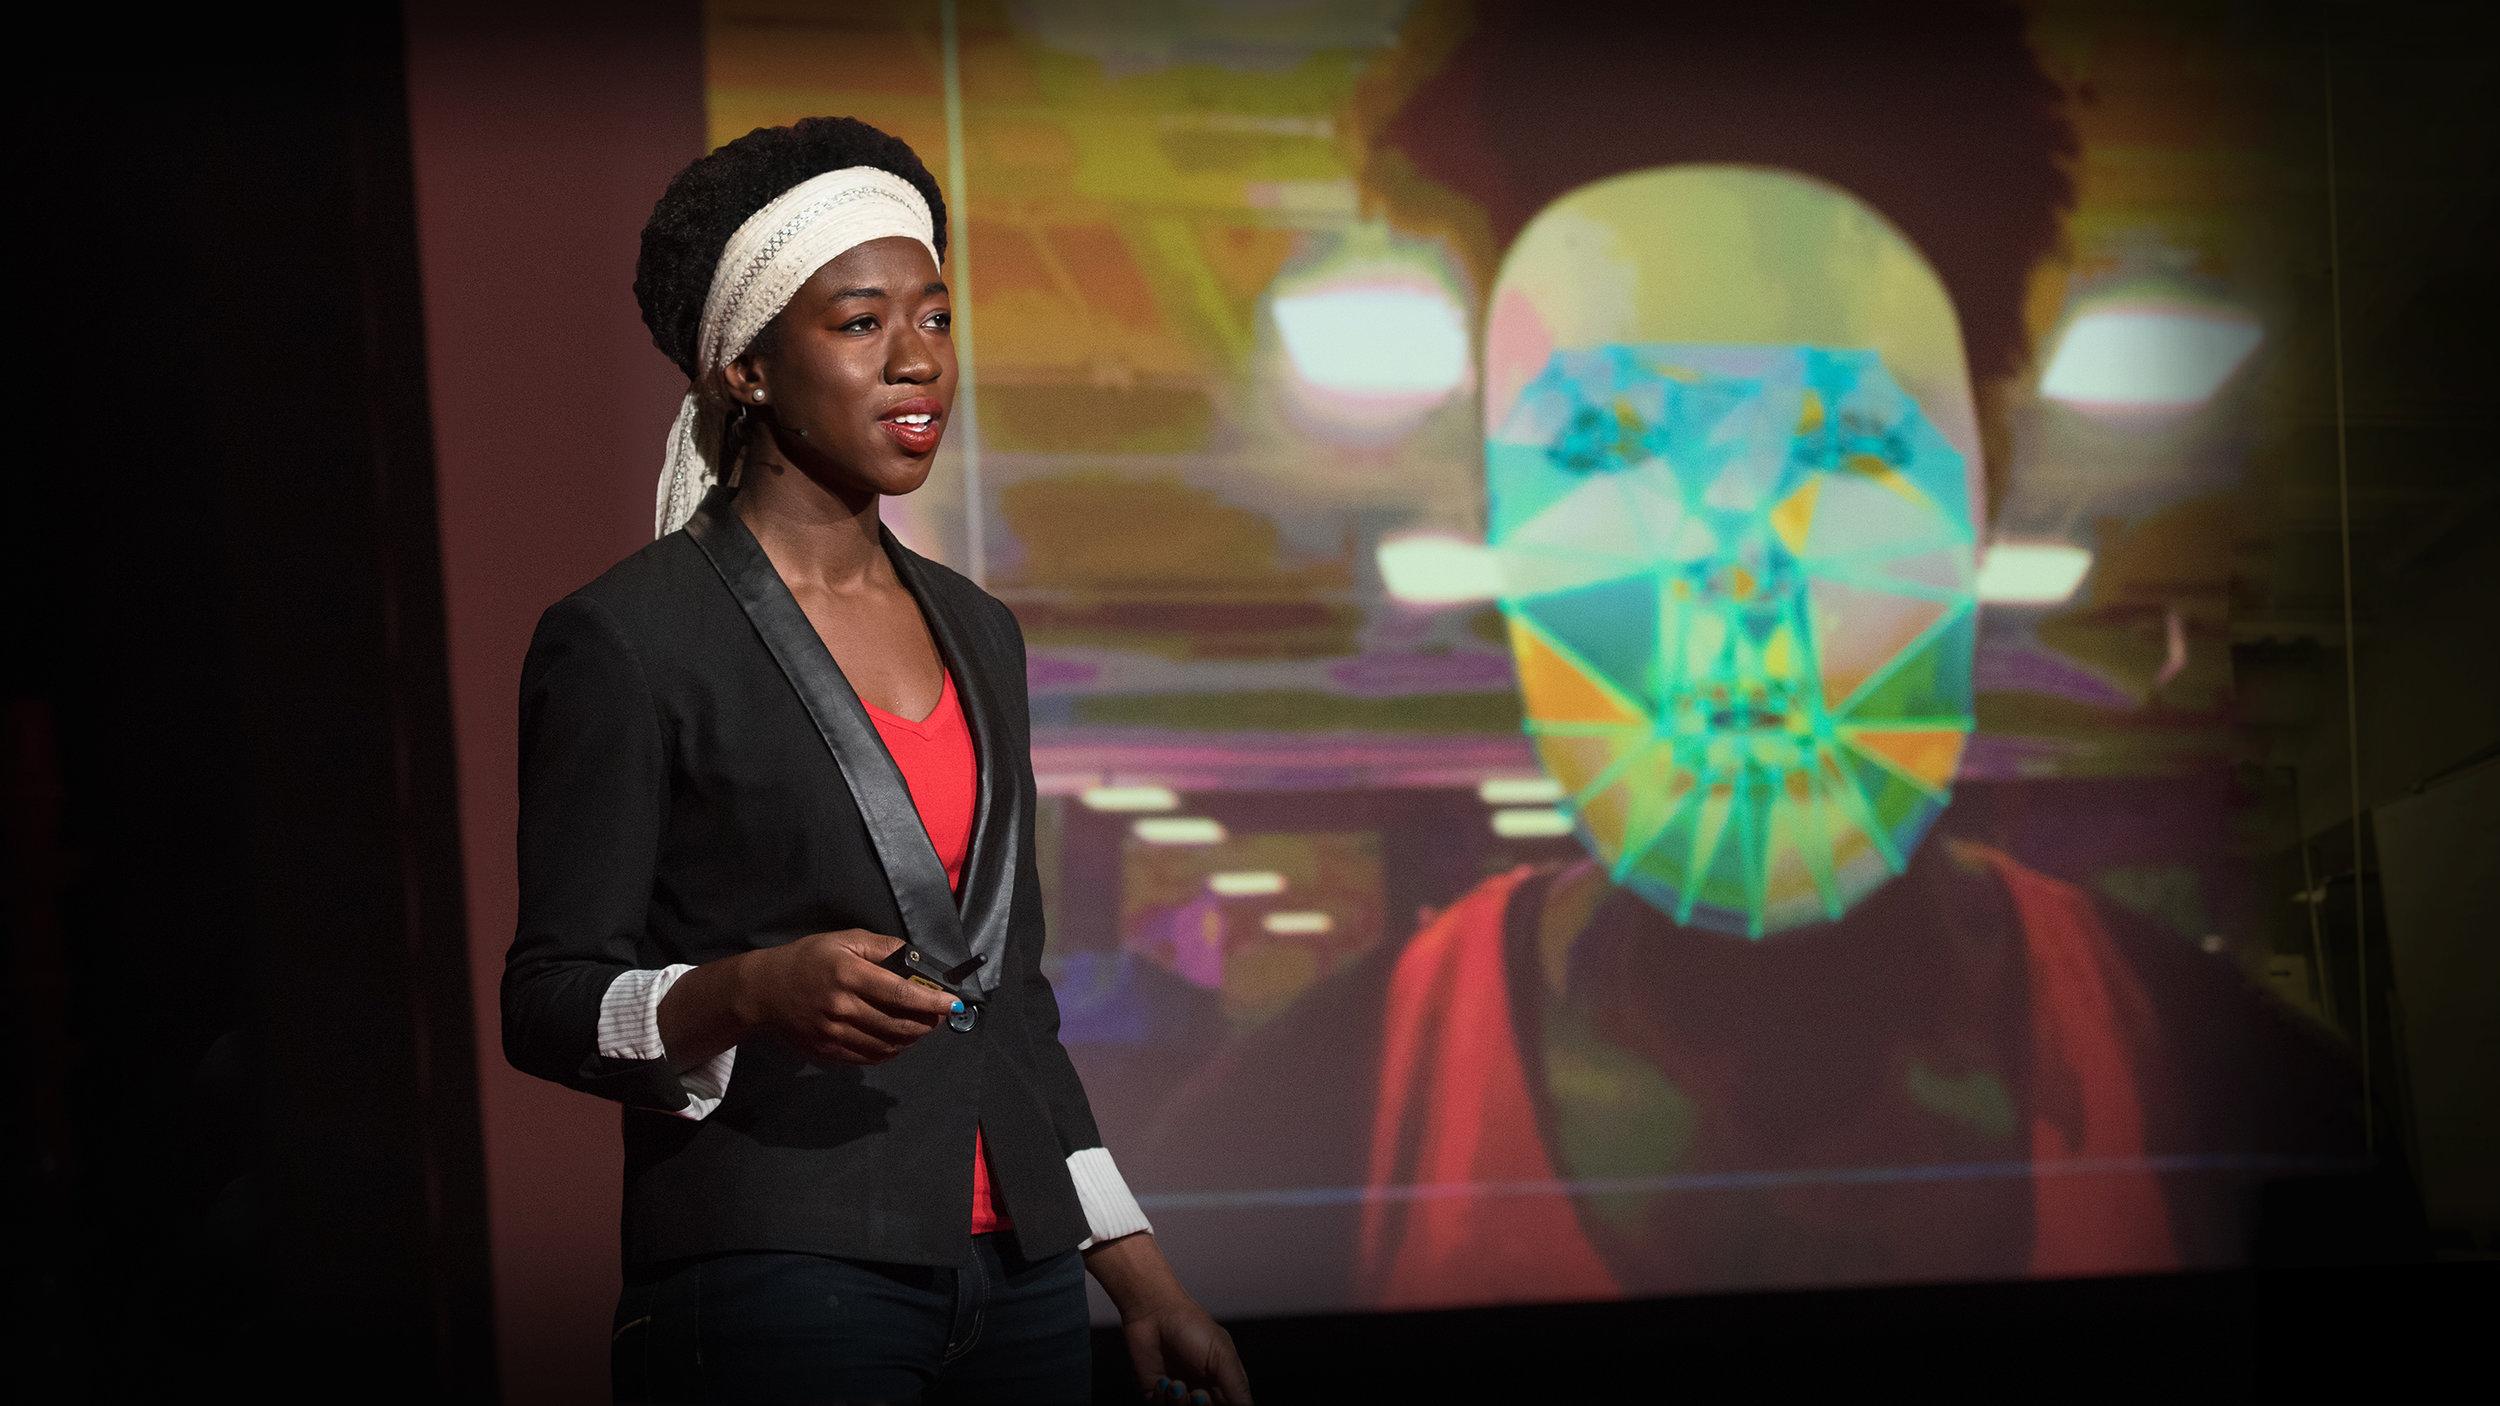 Joy Buolamwini of the Algorithmic Justice League | Photo: TED Talks